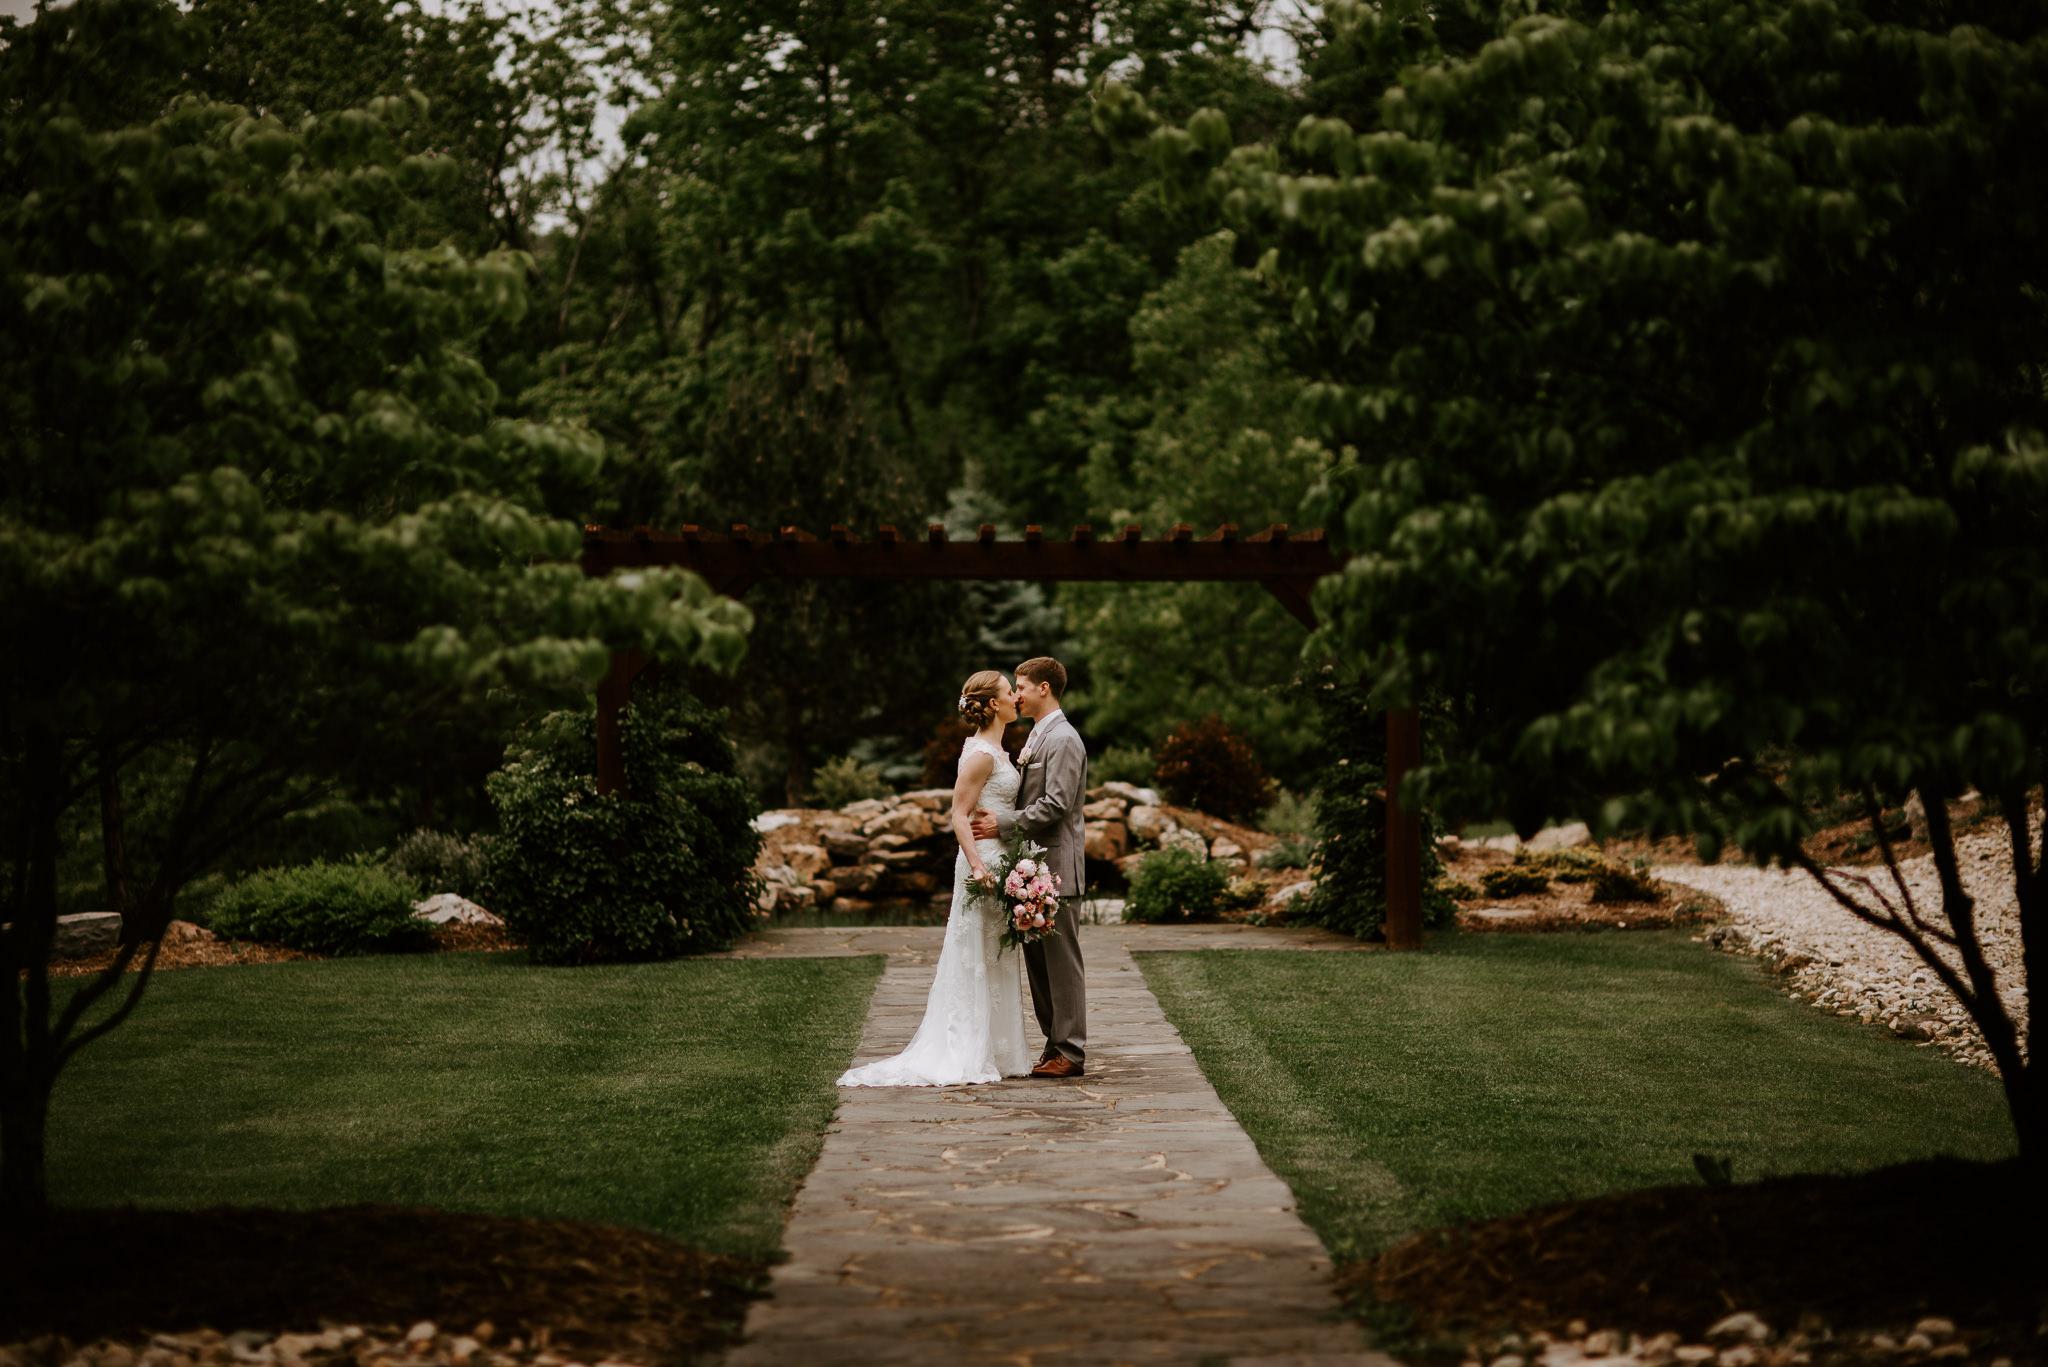 House Mountain Inn - Weddings - Lexington - Virginia - Best Wedding Photographer - Pat Cori Photography-33.jpg